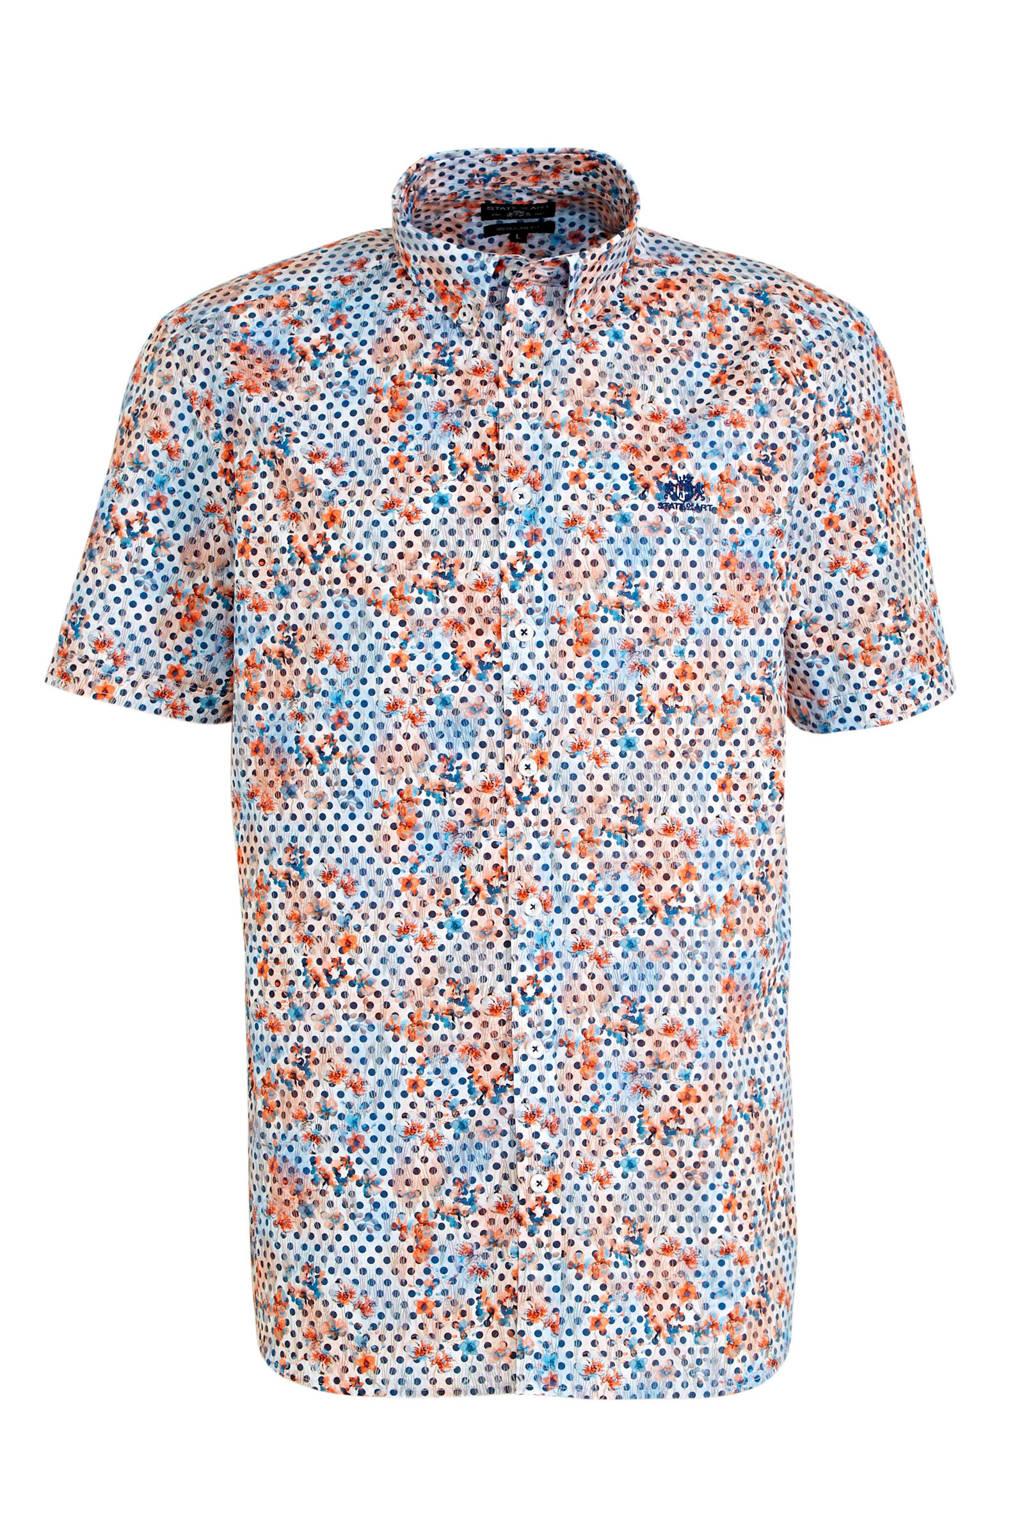 State of Art gebloemd slim fit overhemd kobalt/oranje, Kobalt/oranje